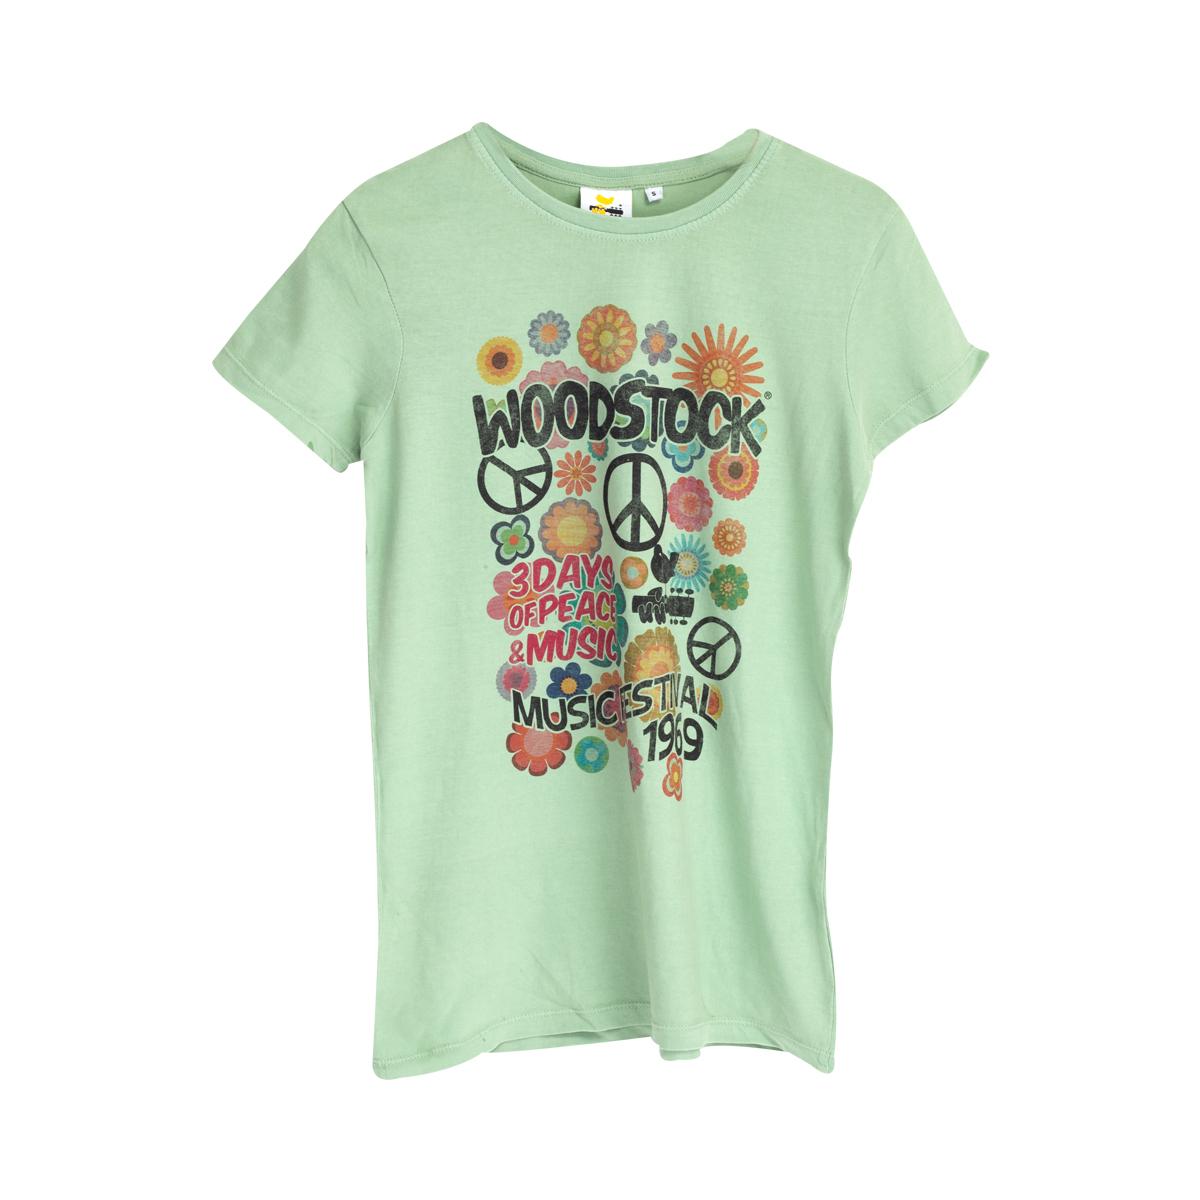 Woodstock Flowers & Peace Green T-Shirt